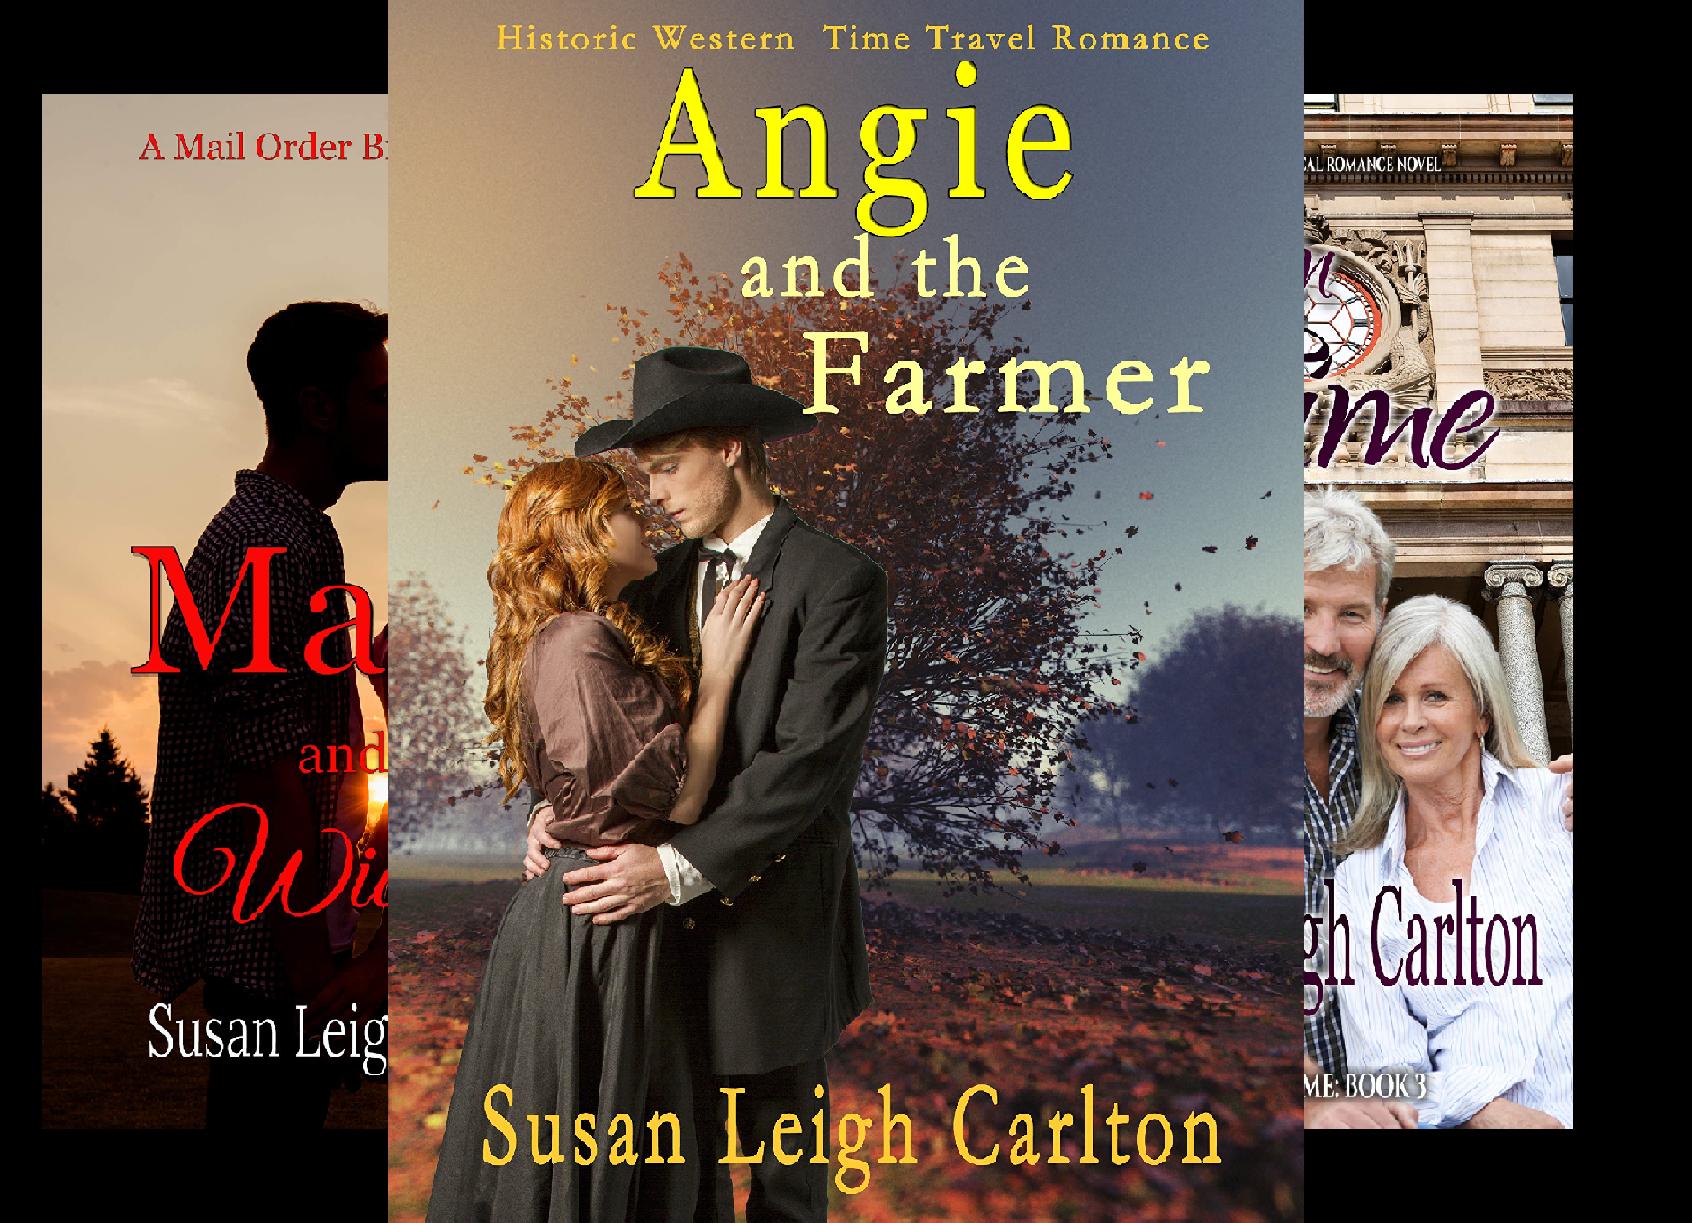 Susan Leigh Carlton Victorian Historical Romance